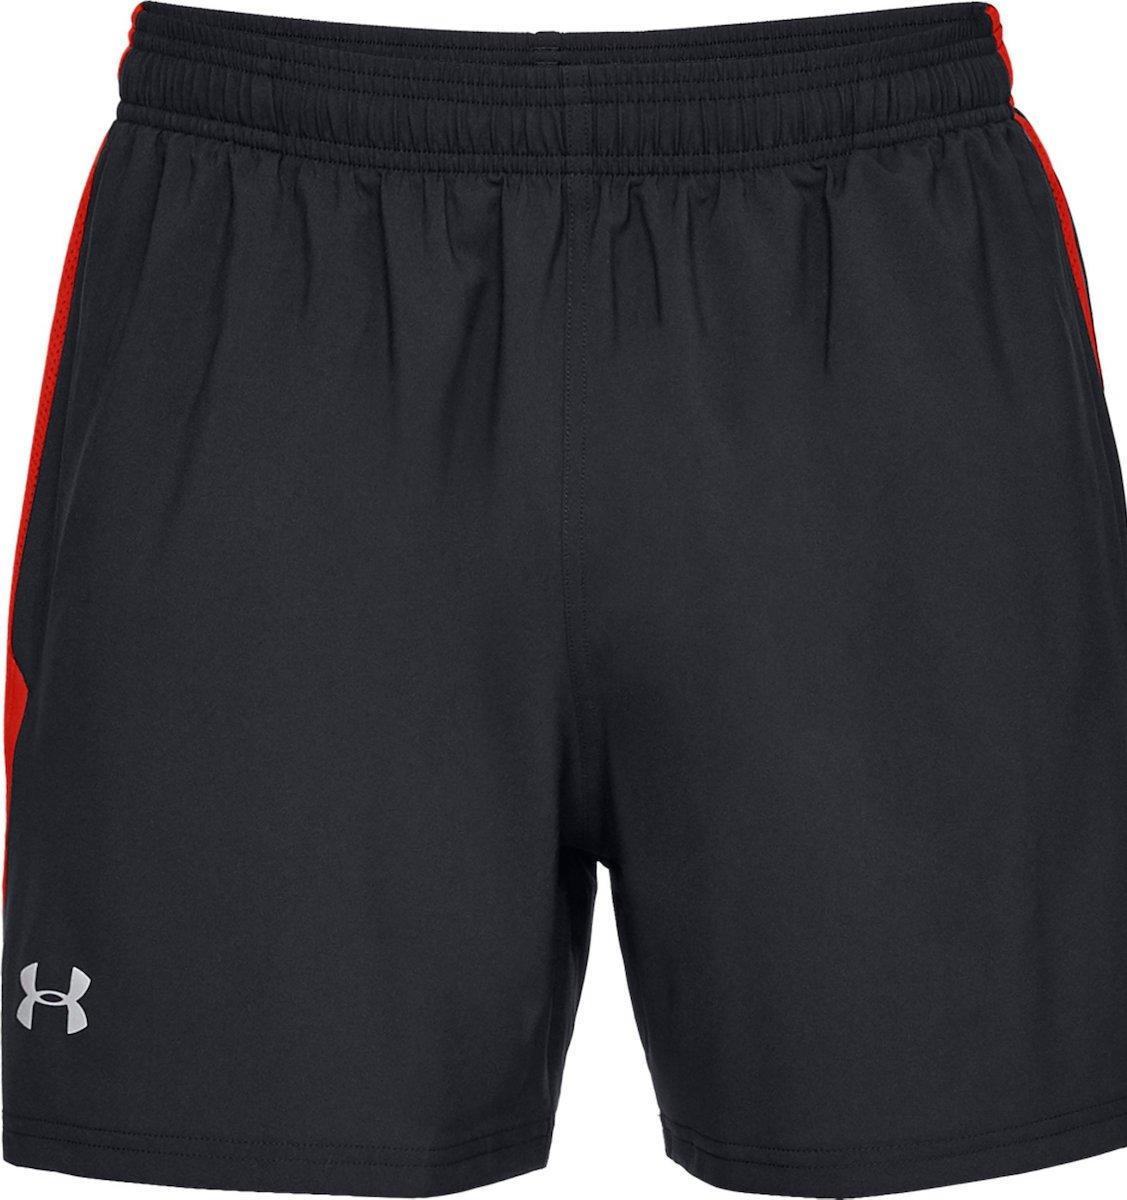 Shorts Under Armour UA LAUNCH SW 5'' SHORT